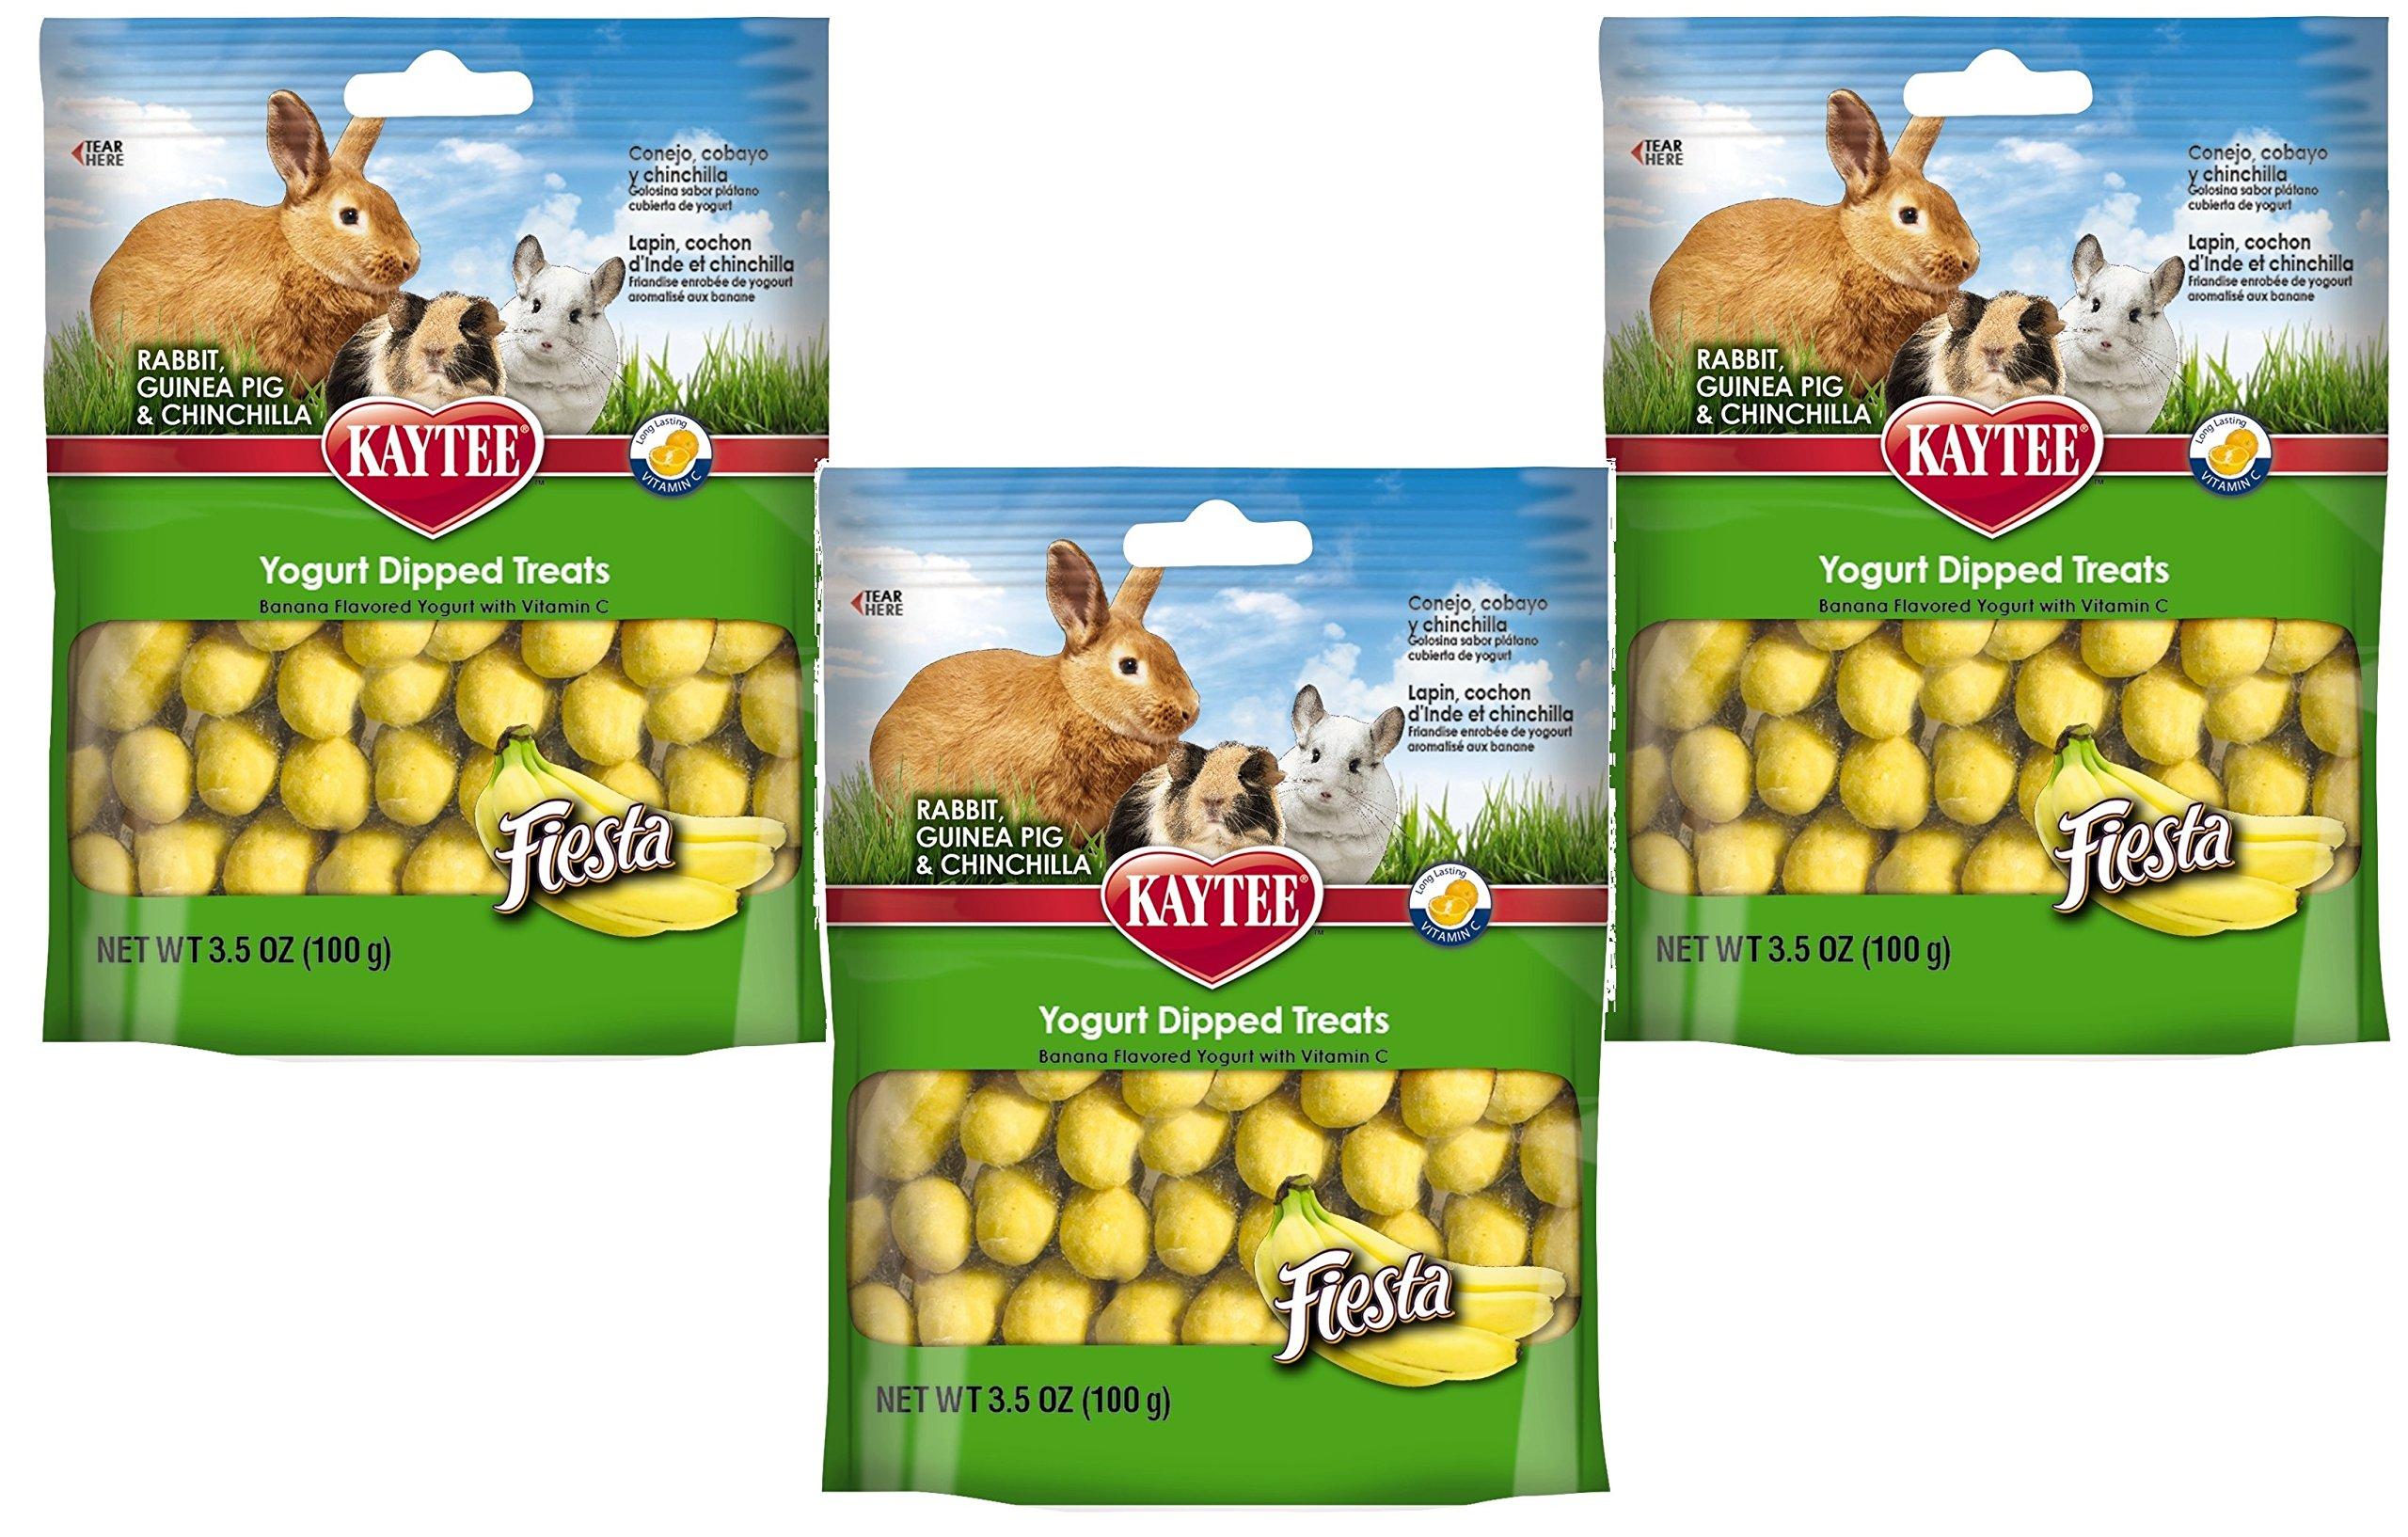 (3 Pack) Kaytee Fiesta Yogurt Dipped Small Animal Treat, 3.5-Ounce, Banana Flavor